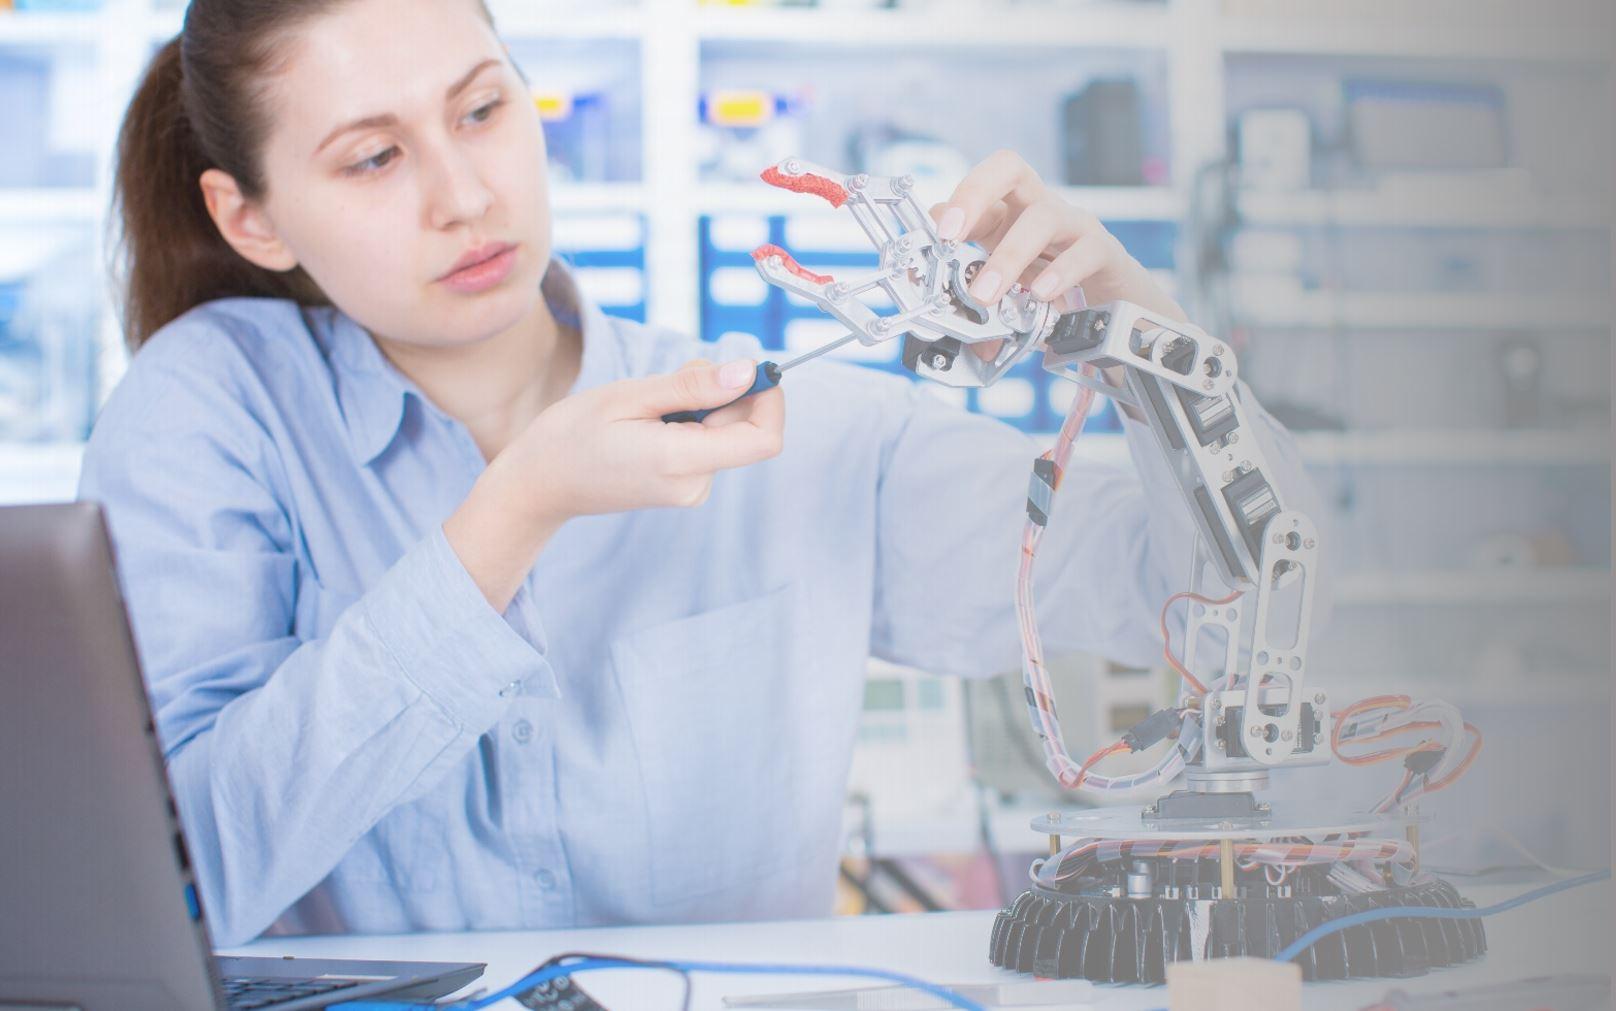 Global STEM Education Northrop Grumman